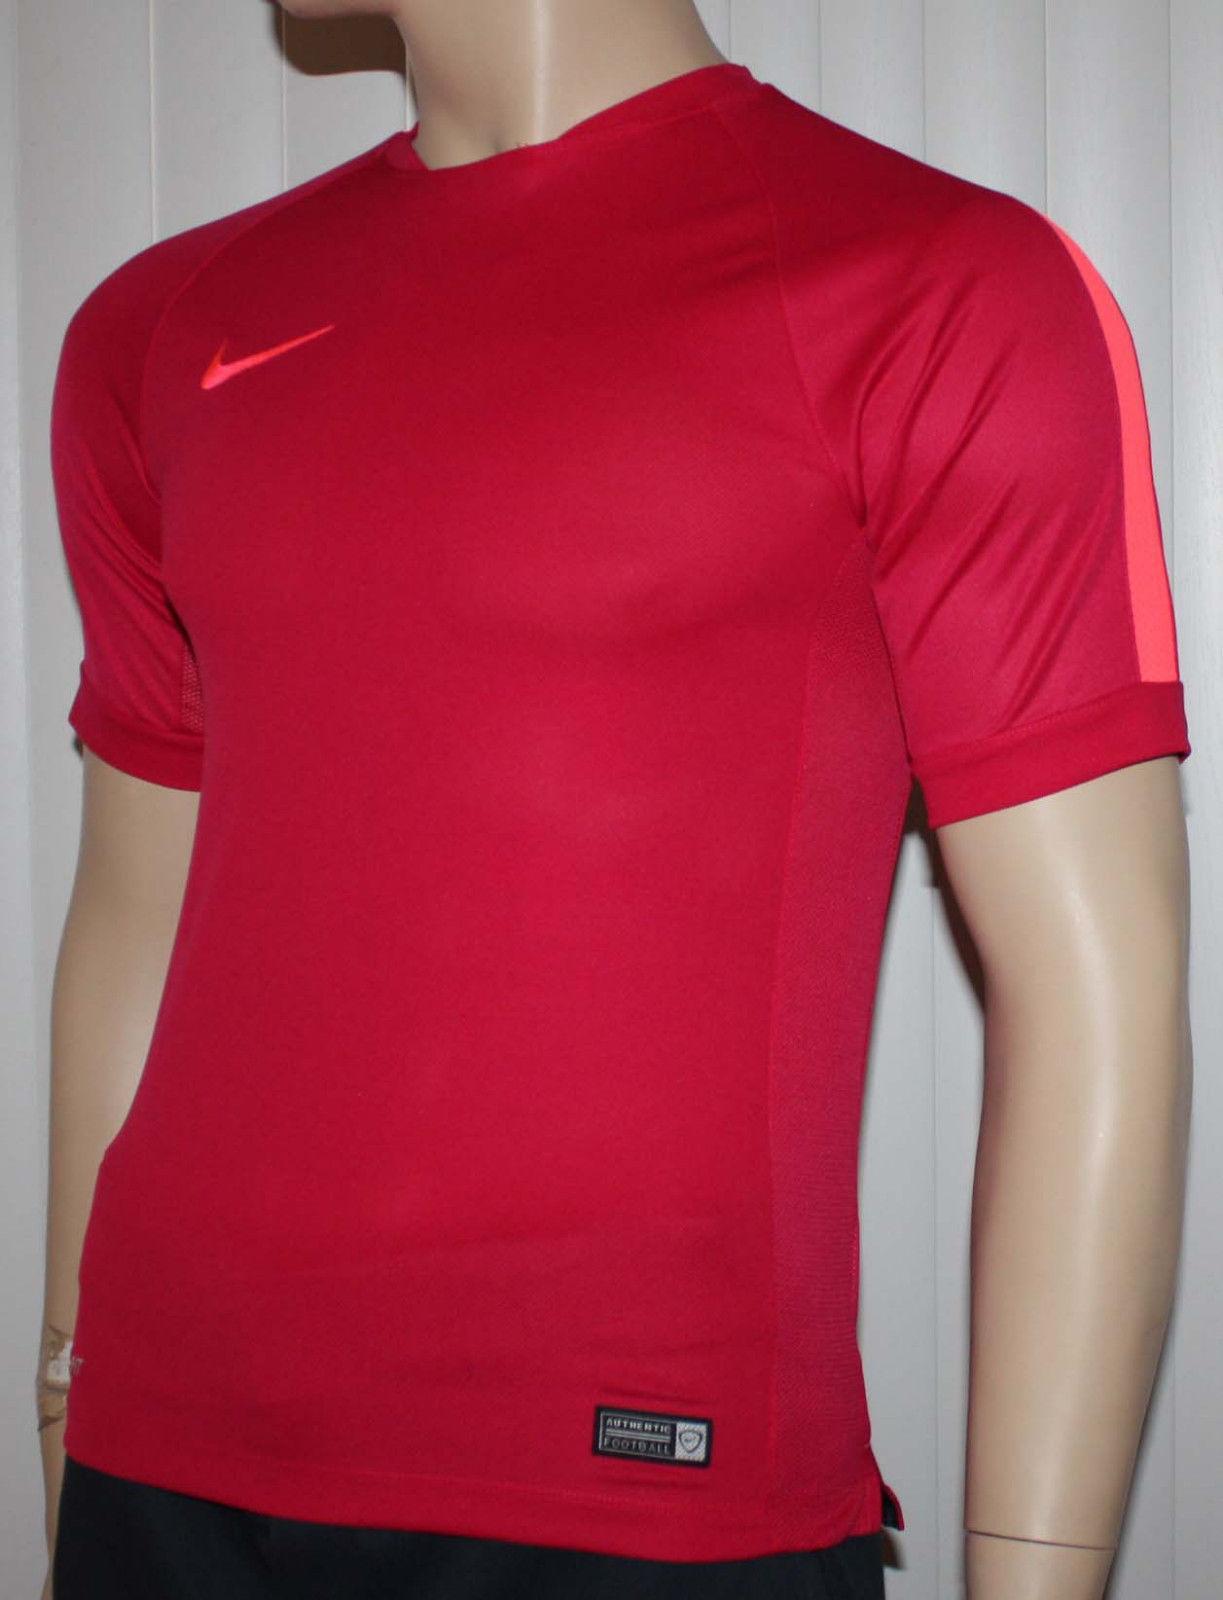 Nike Men's Squad Flash Dri-Fit Fuchsia Force/Hyper Punch Swoosh Shirt (Several Sizes) 11140